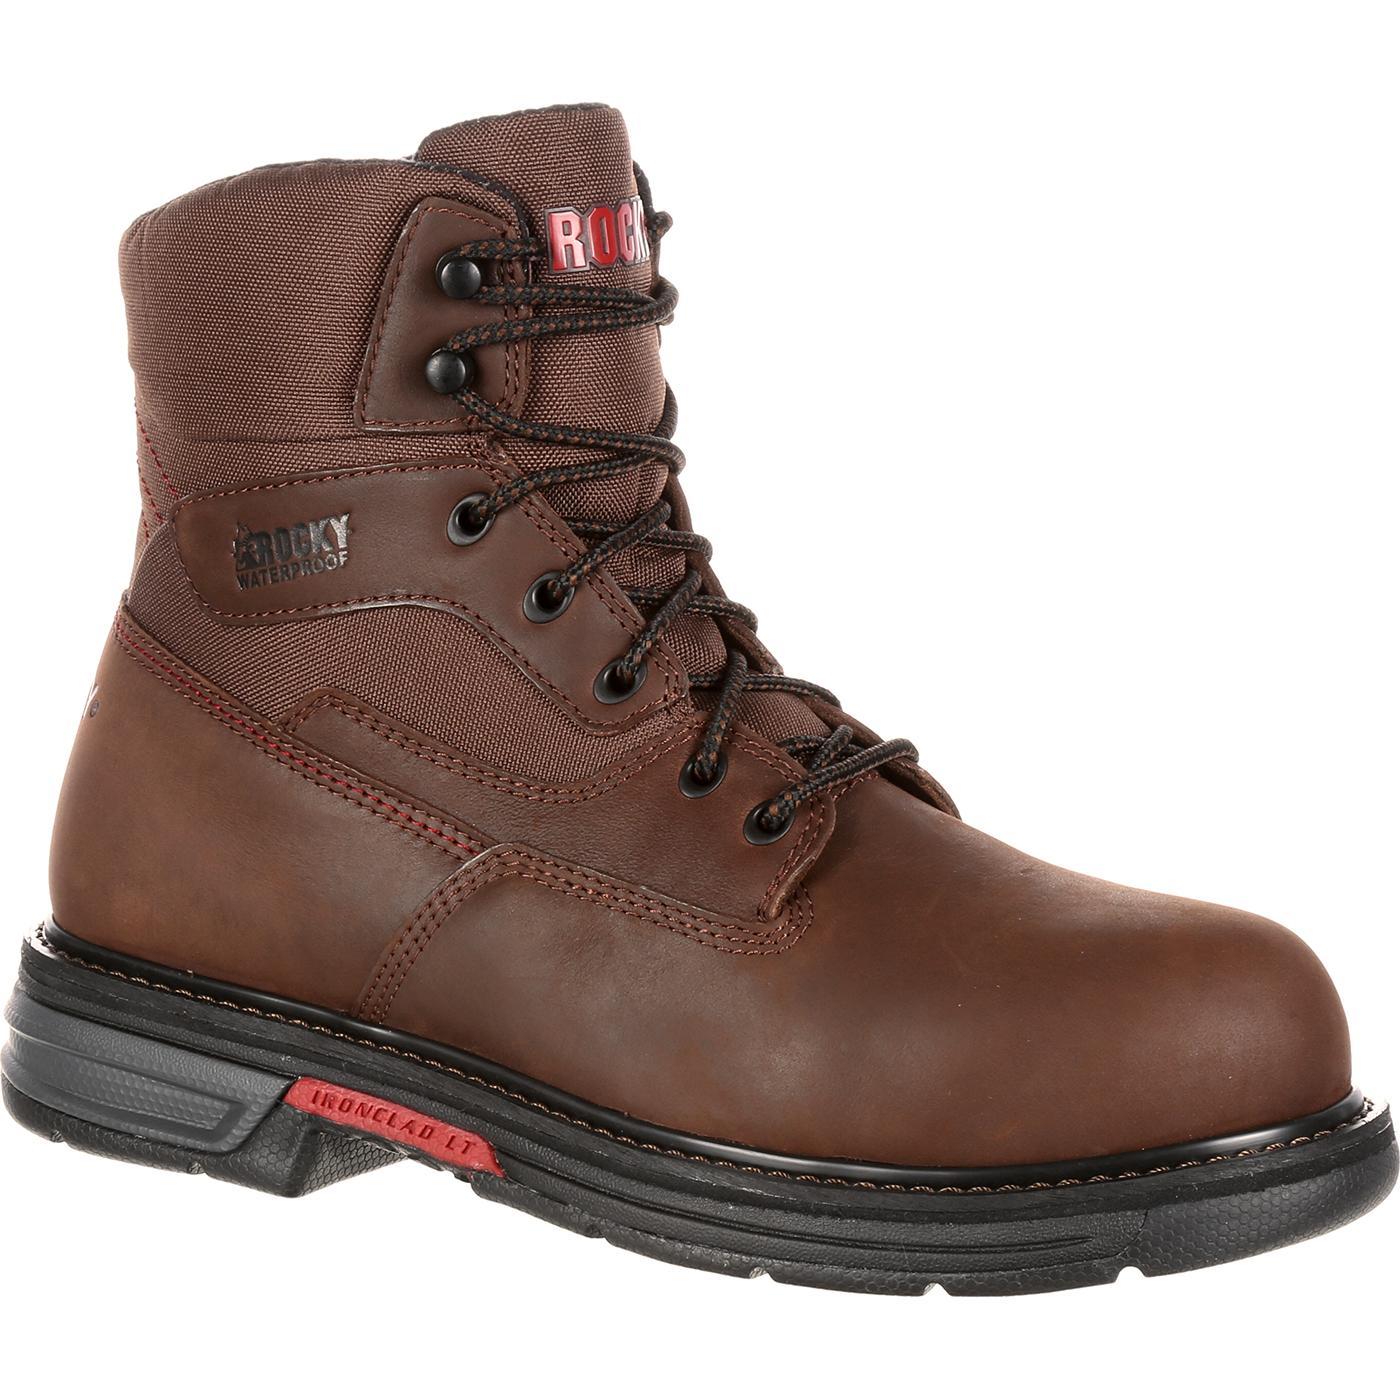 Rocky Ironclad LT: Men's Steel Toe Waterproof Work Boots